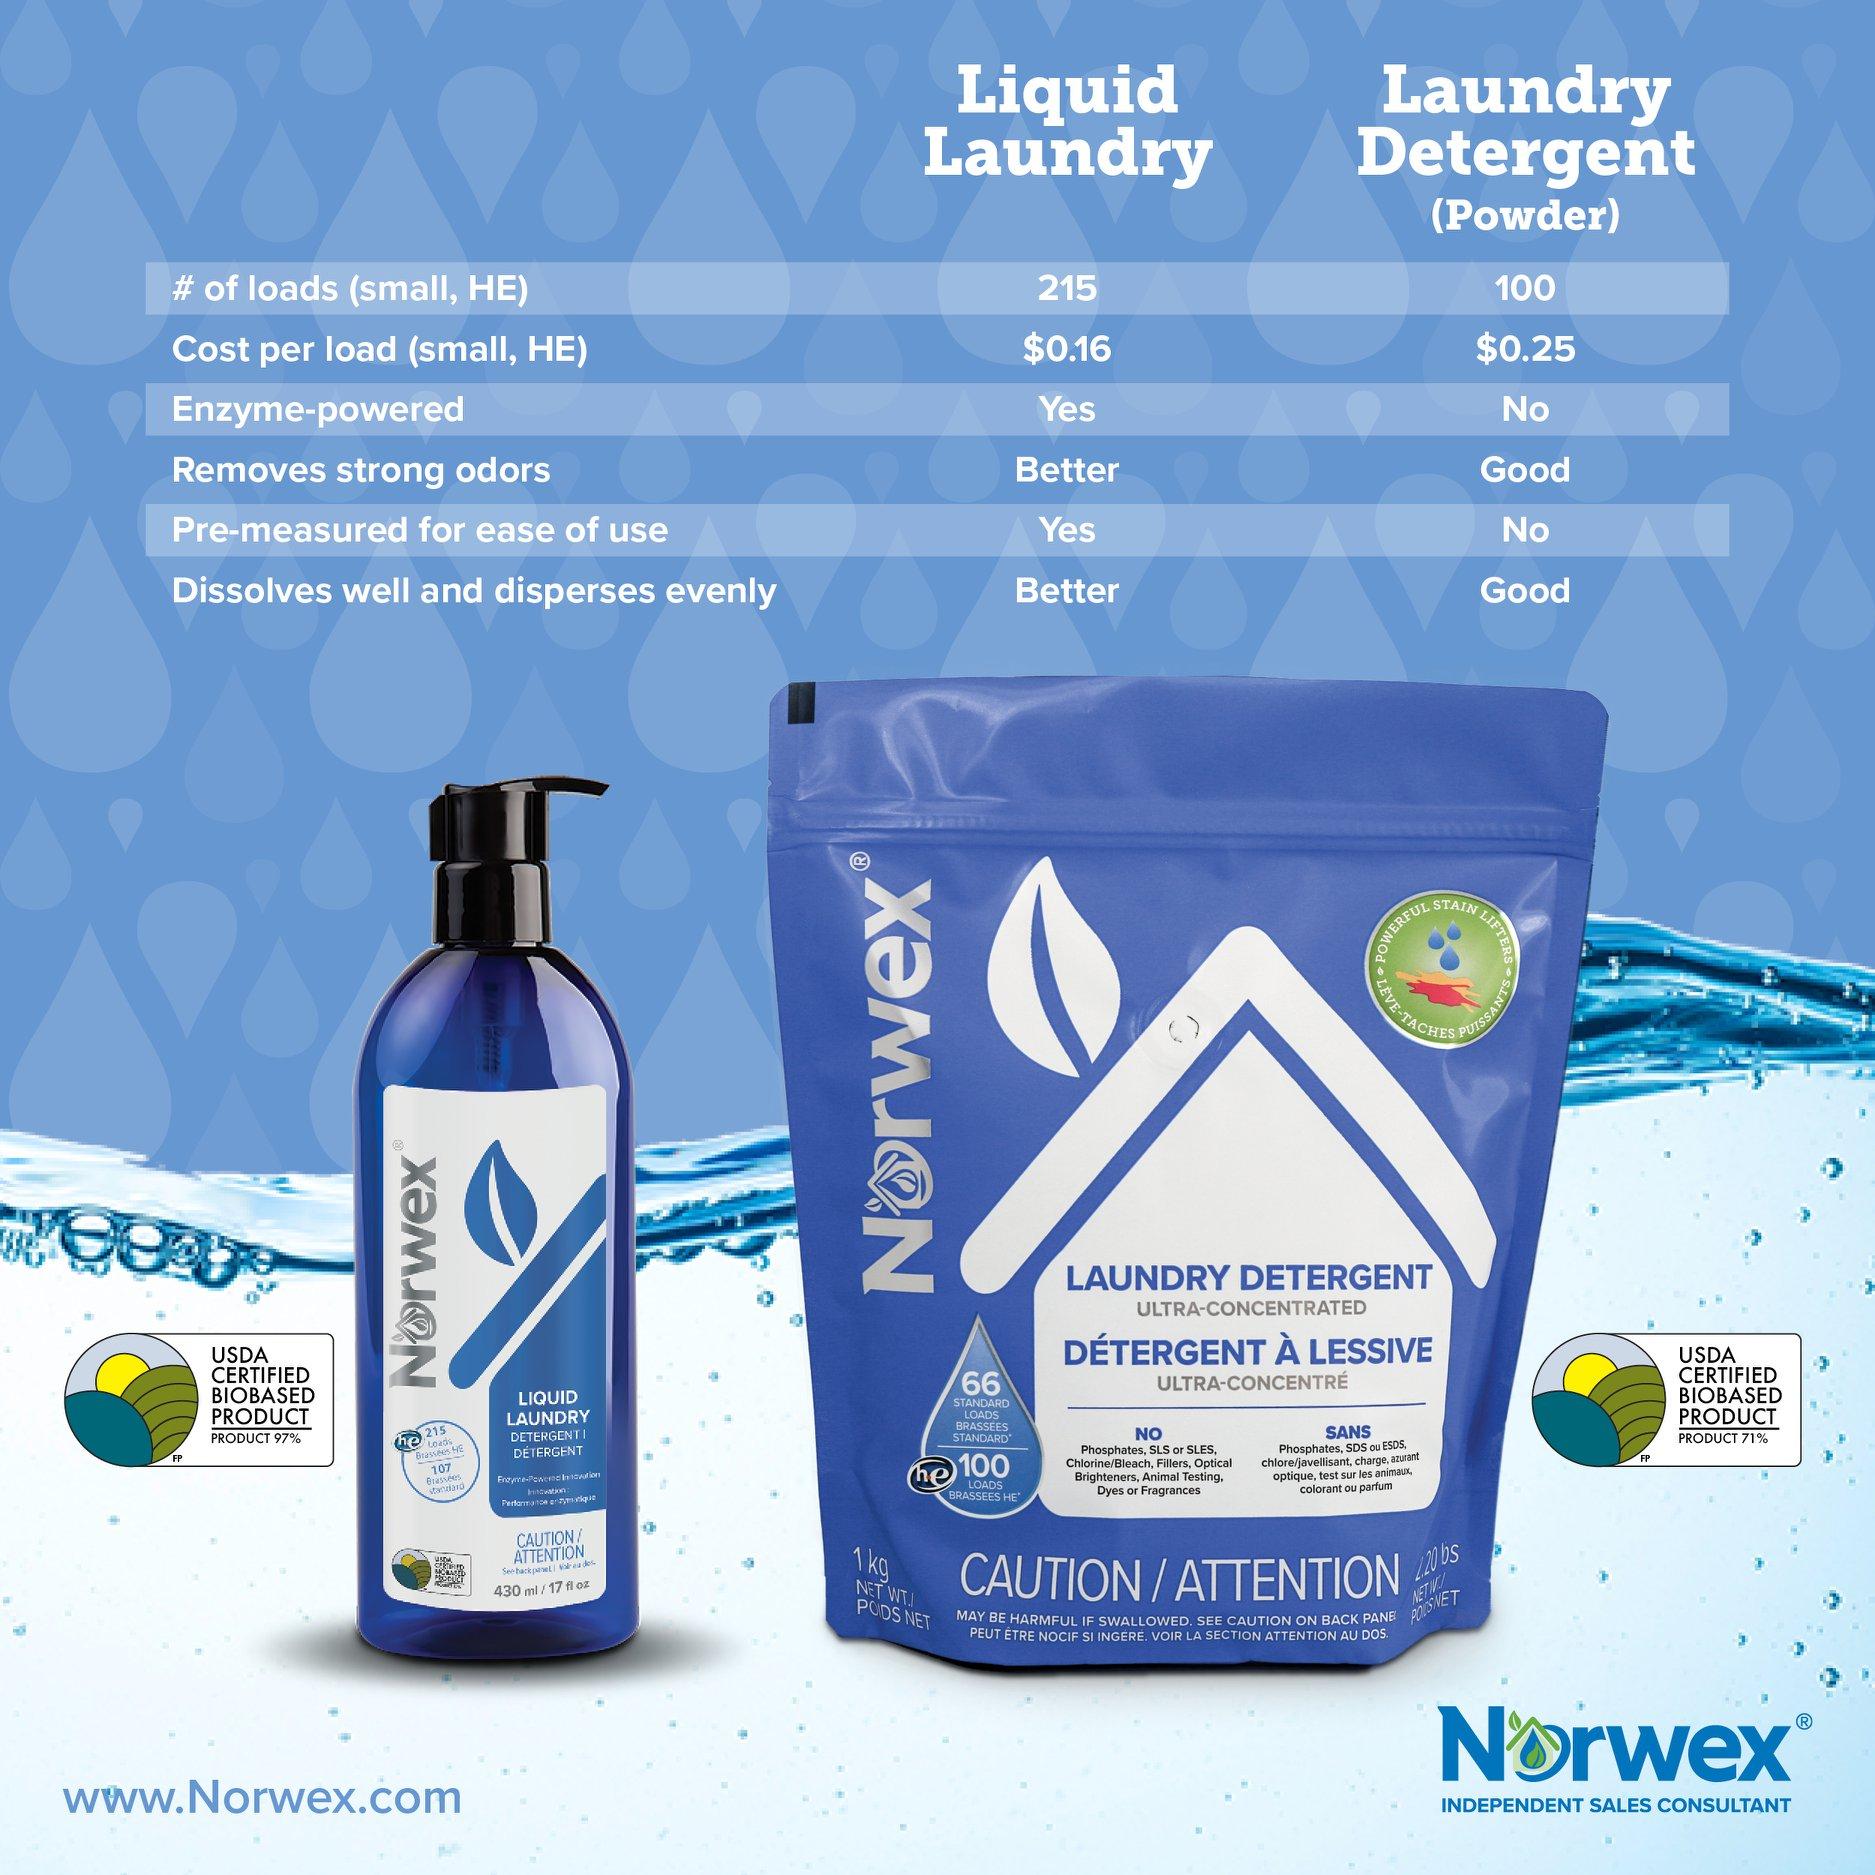 Landry detergent liquid and powder new formulations